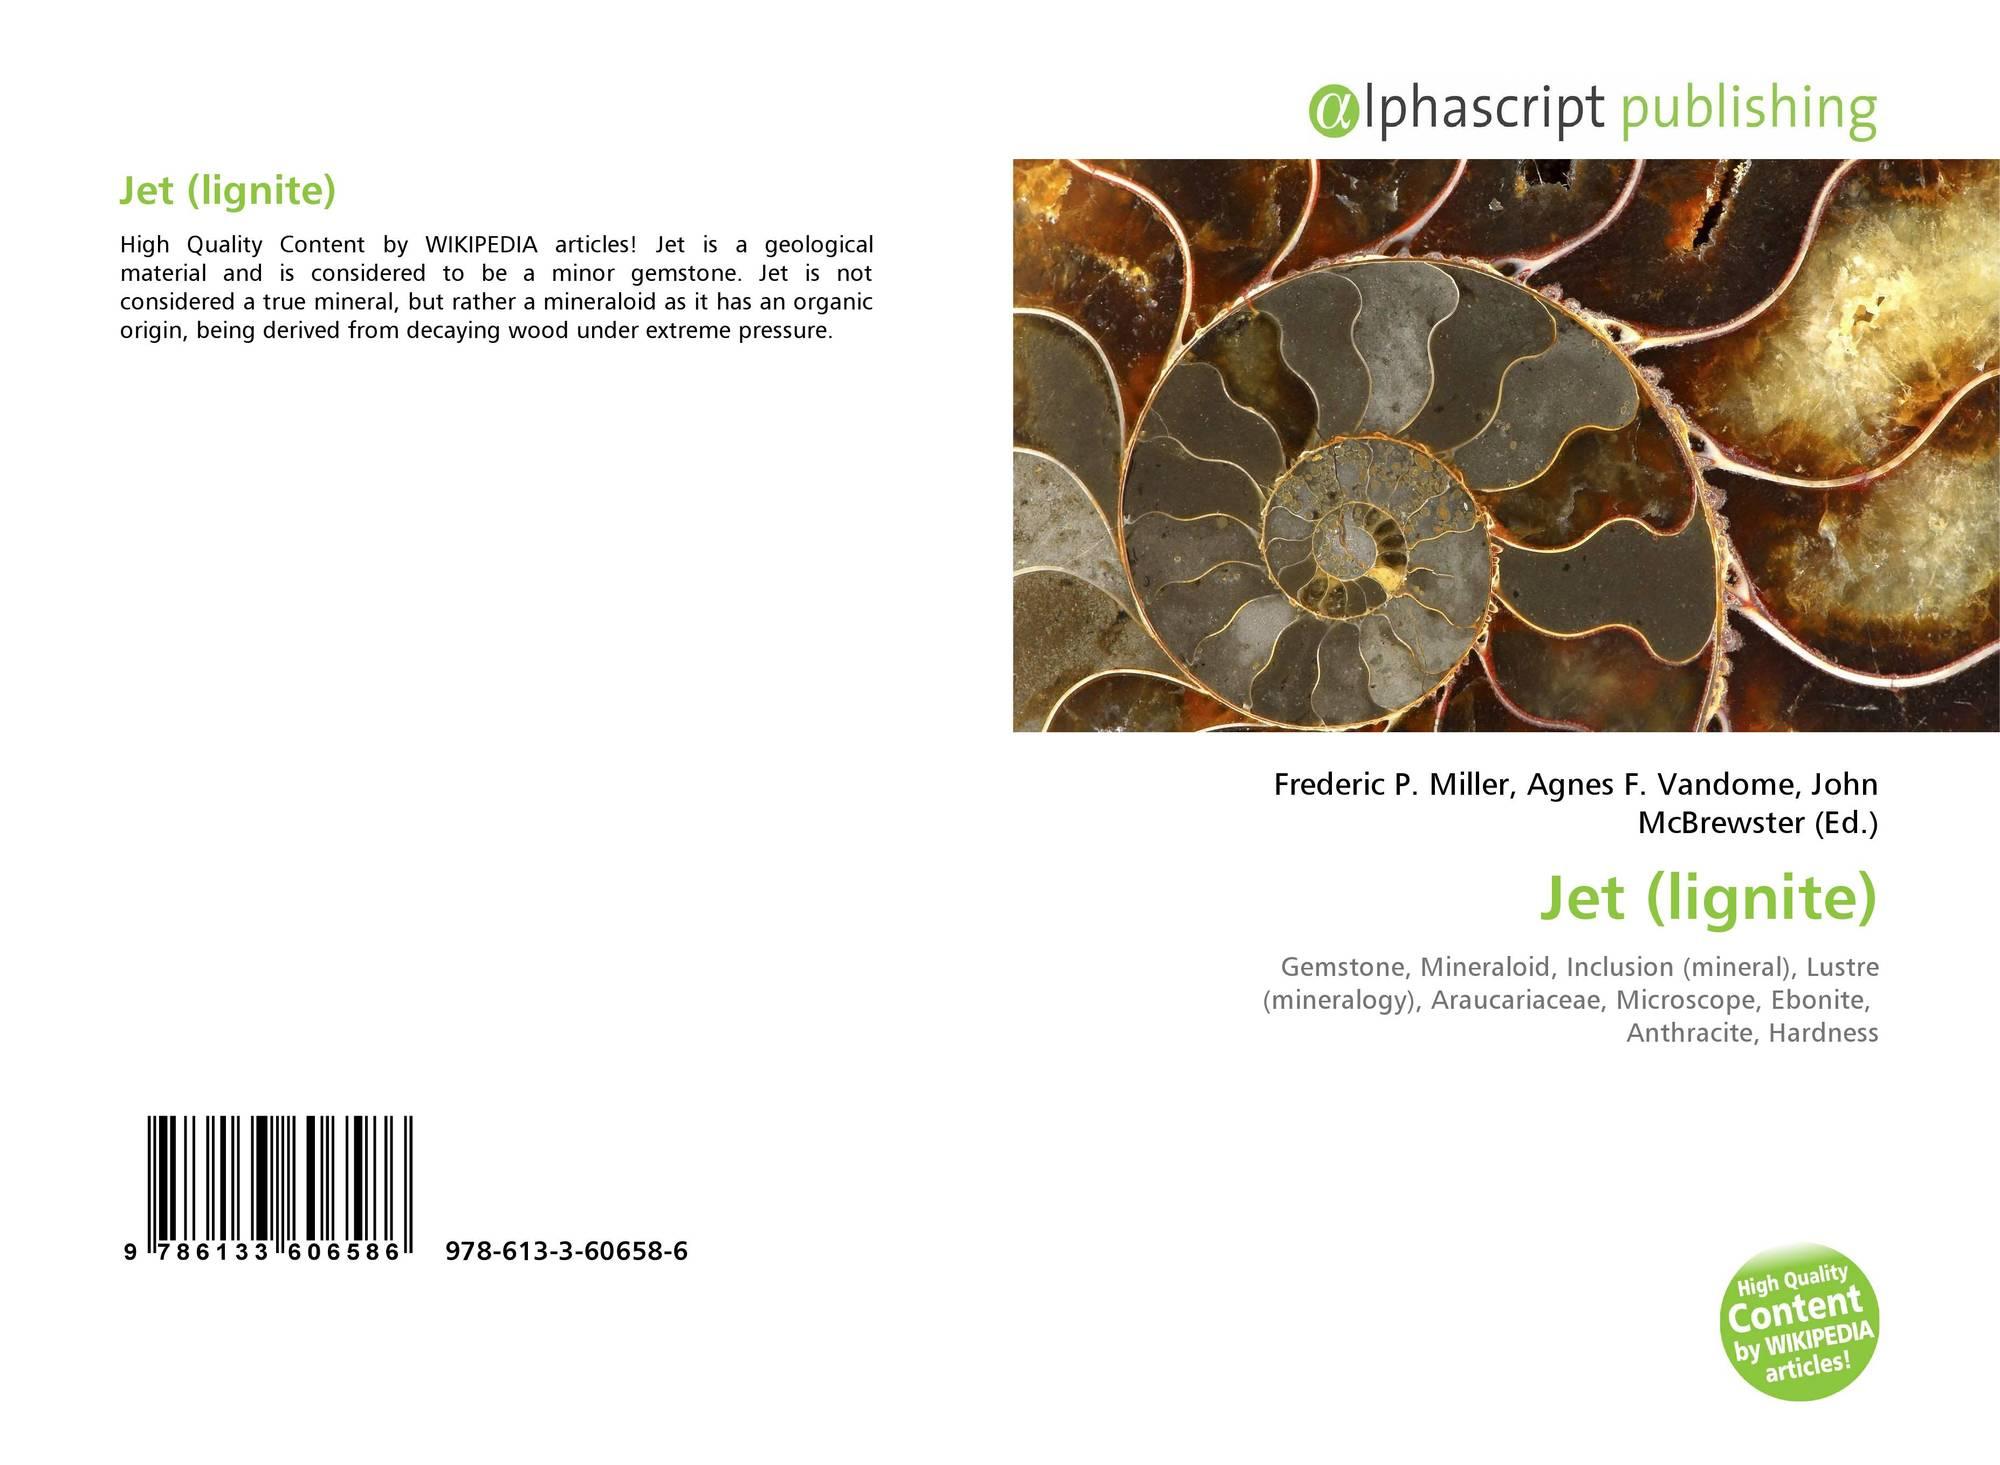 Jet Lignite 978 613 3 60658 6 6133606584 9786133606586